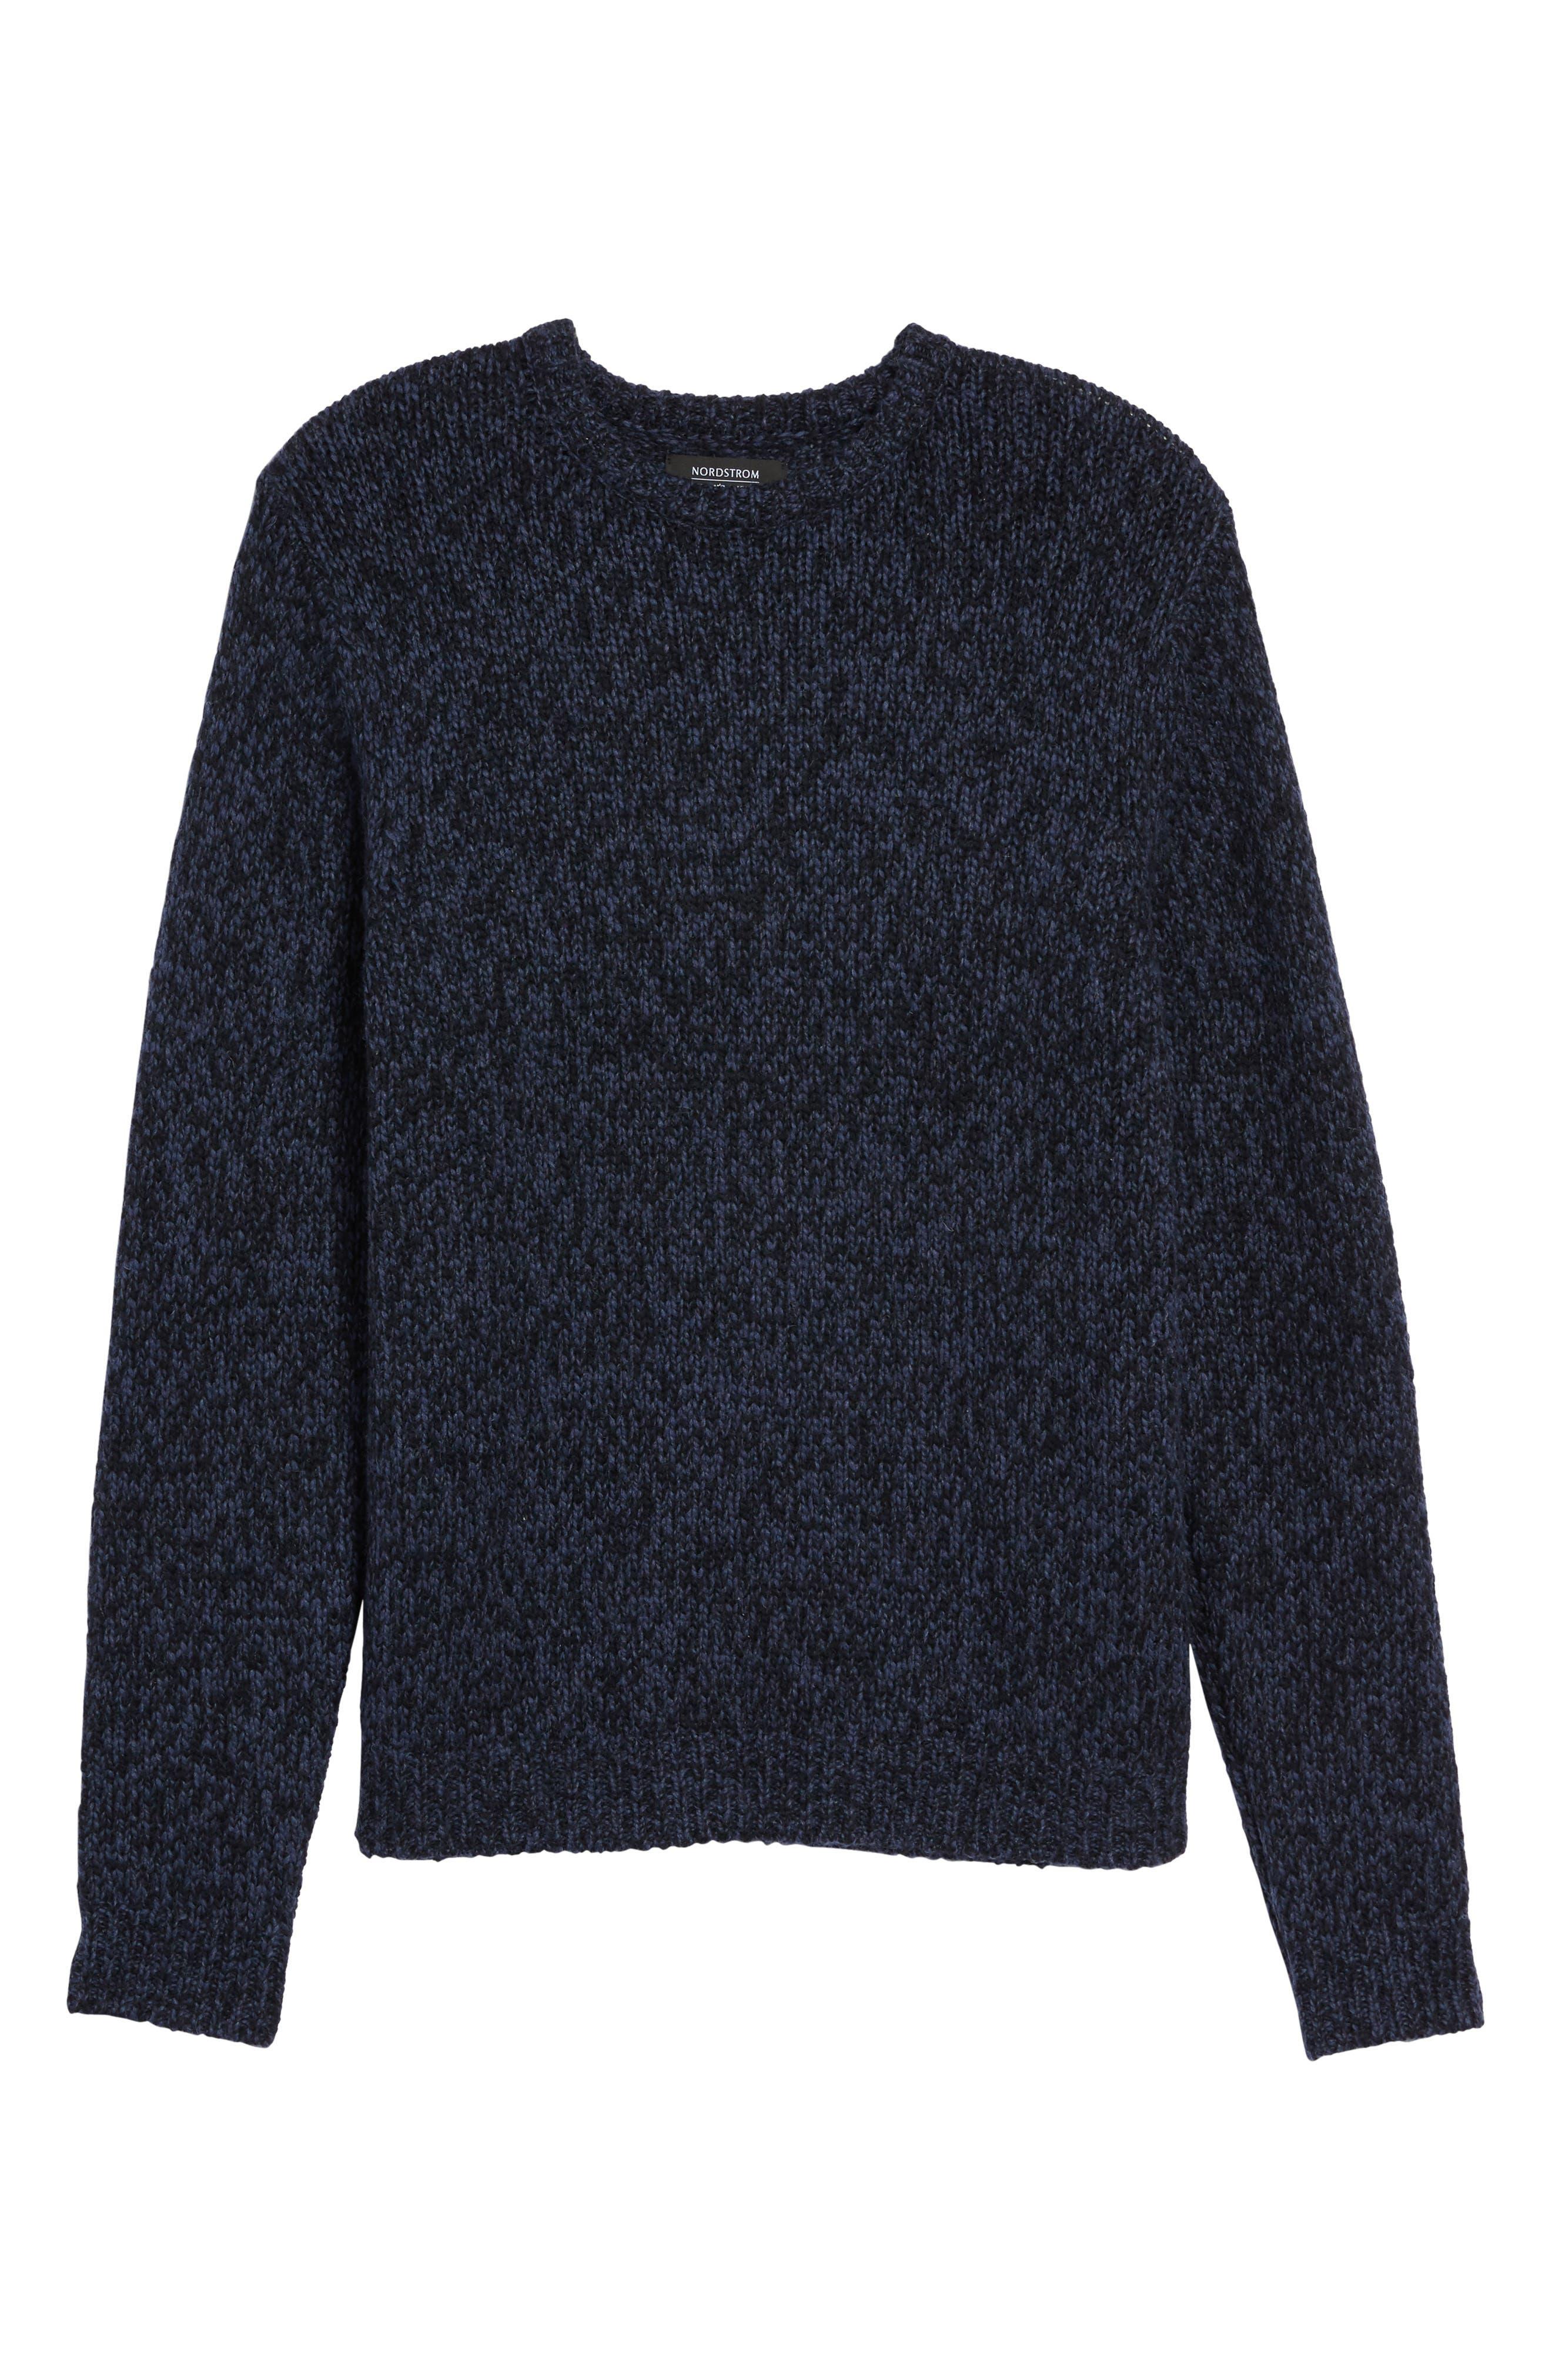 Marled Yarn Sweater,                             Alternate thumbnail 12, color,